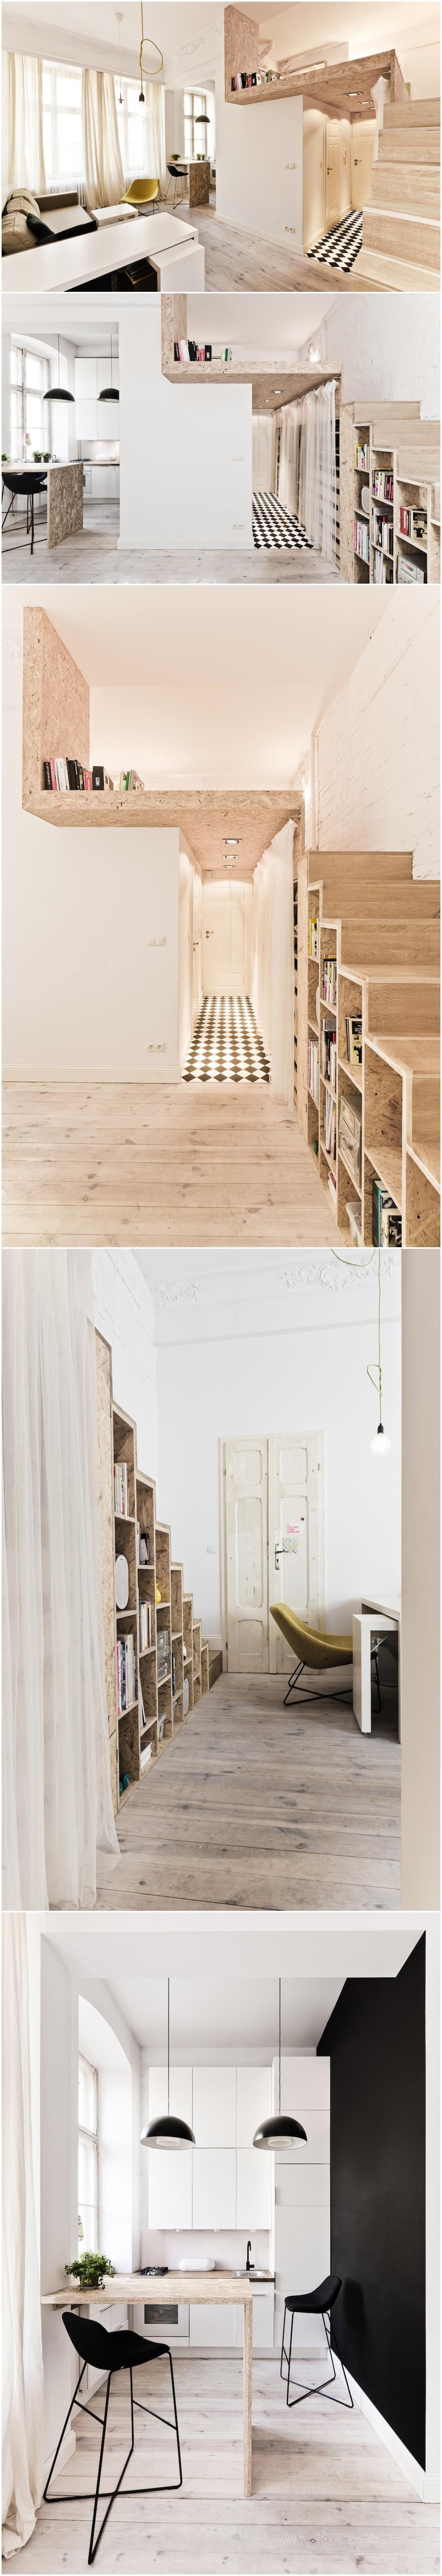 20 diy design how to build a mezzanine floor ideas at cost 20 diy design how to build a mezzanine floor ideas at cost fomfest solutioingenieria Image collections